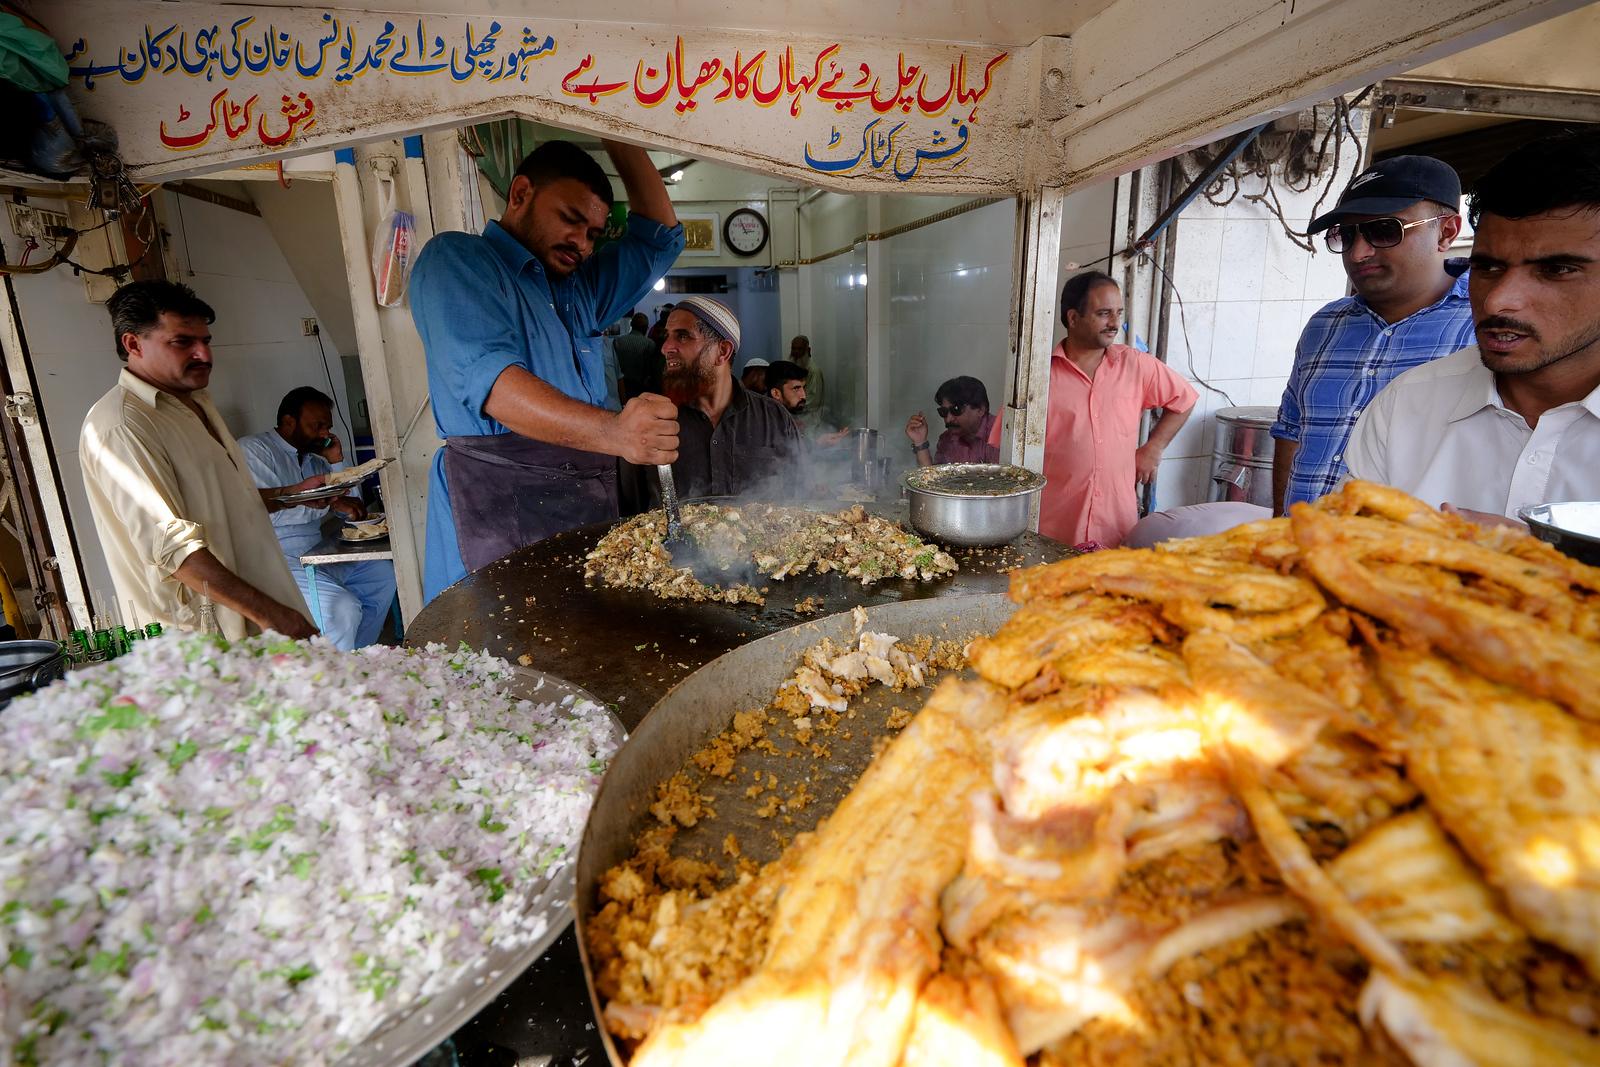 Fish Kata-Kat at Masha Allah in Karachi